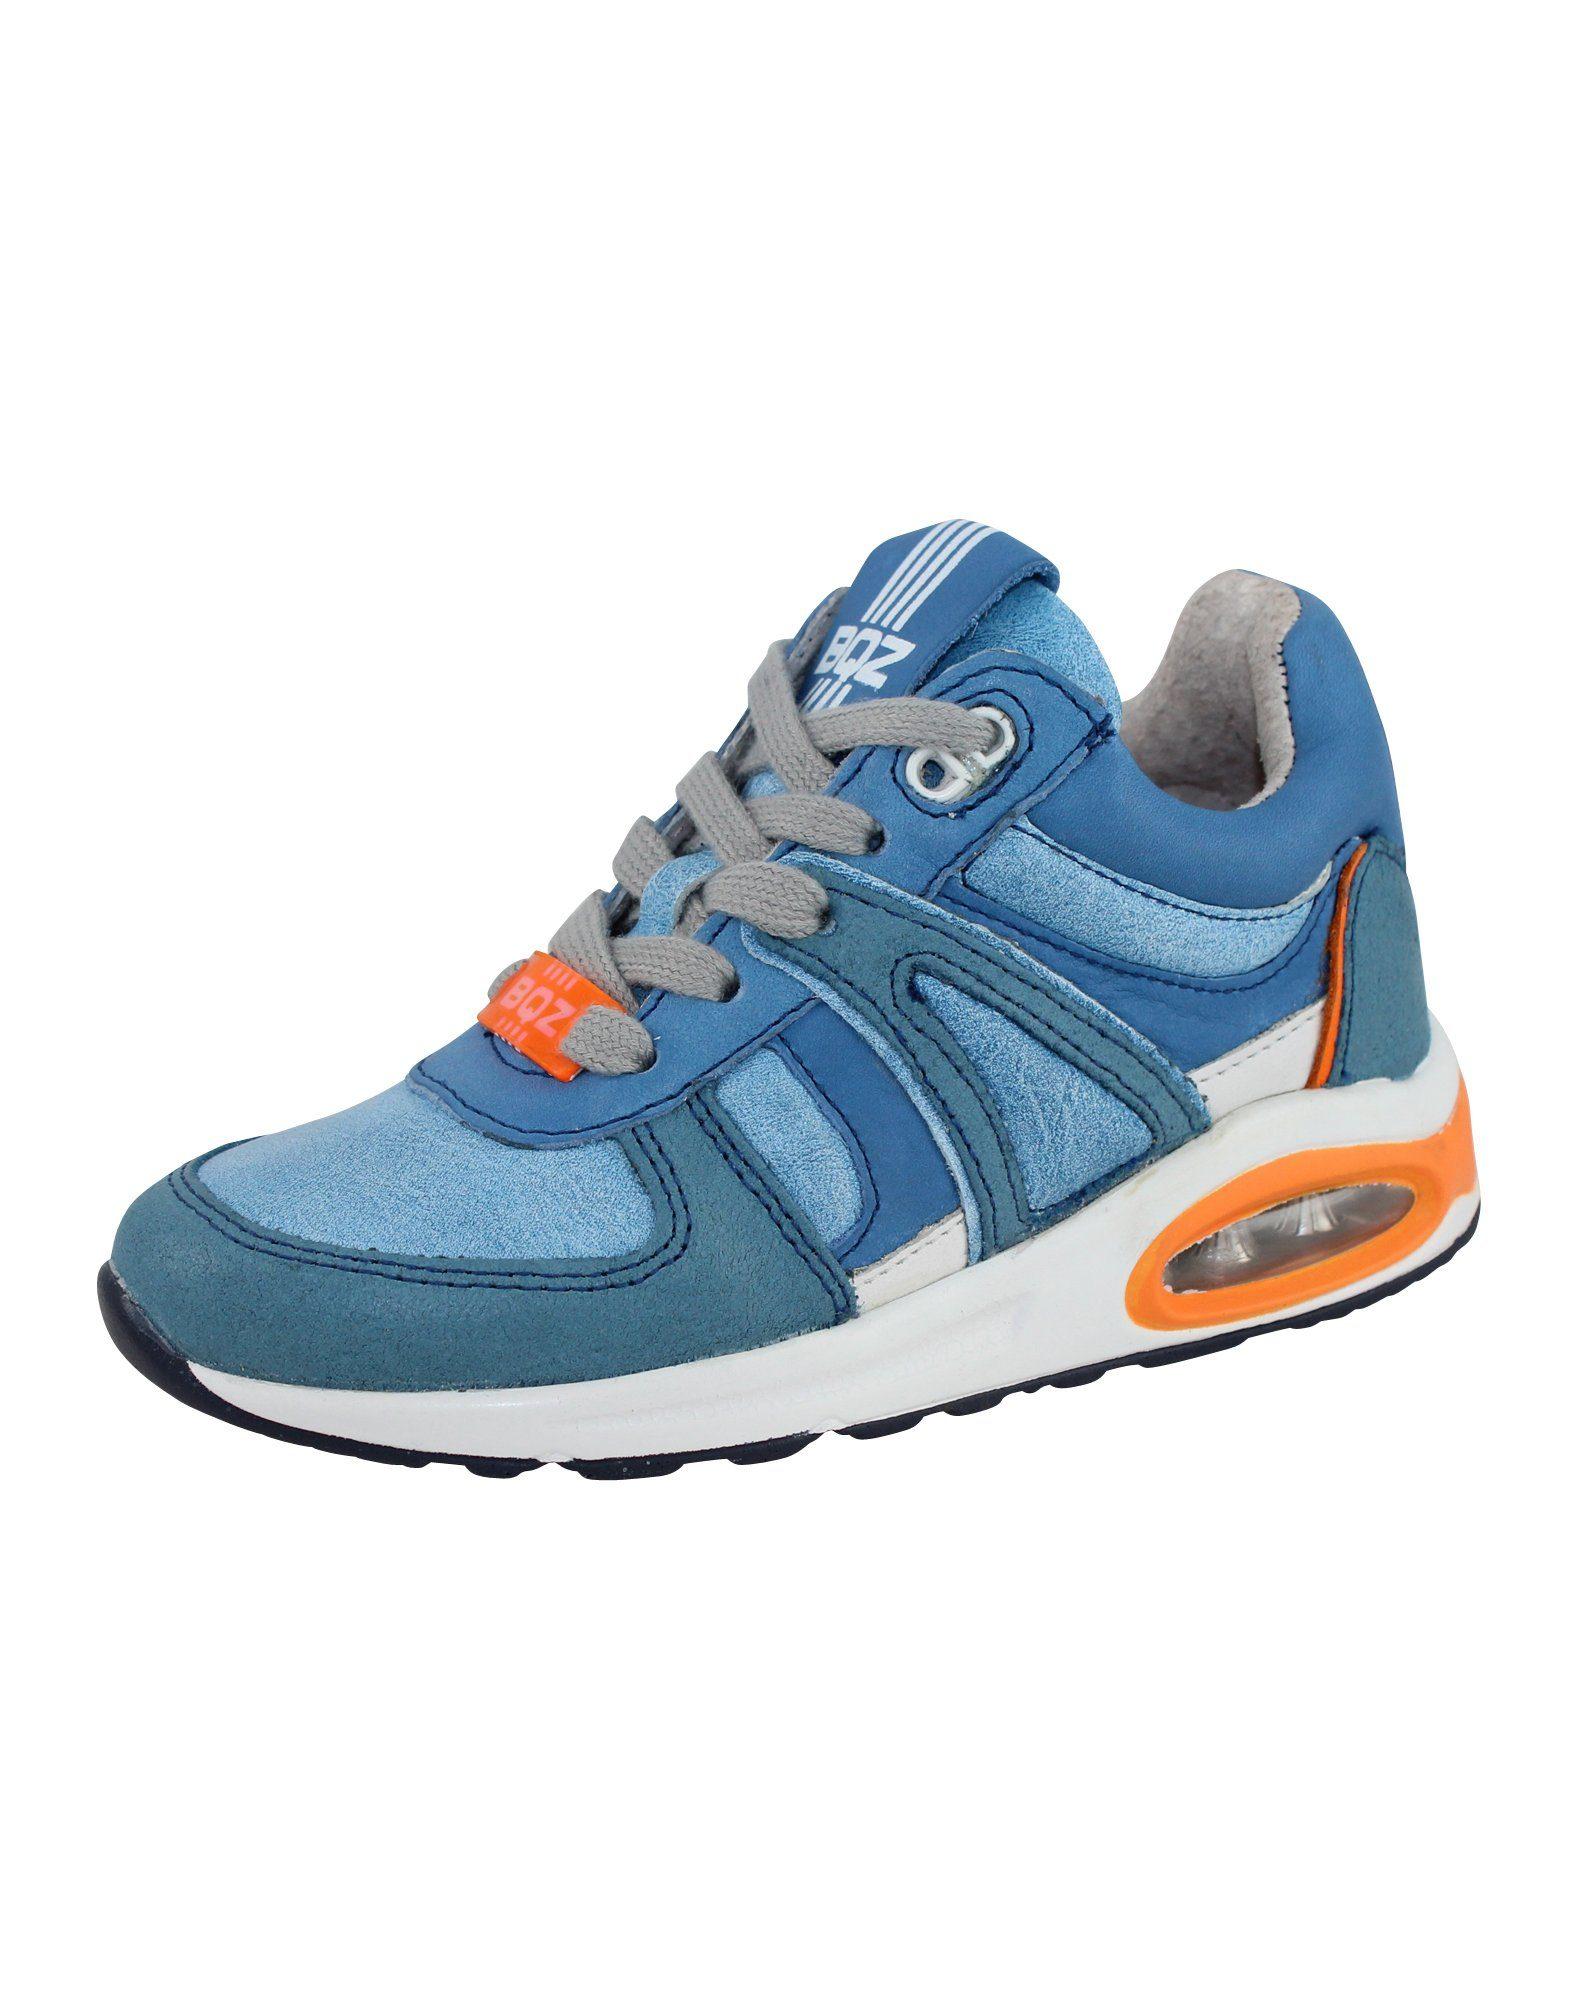 Sneakers Fergie 2 Taupe Kornblau kY5wXWIviI